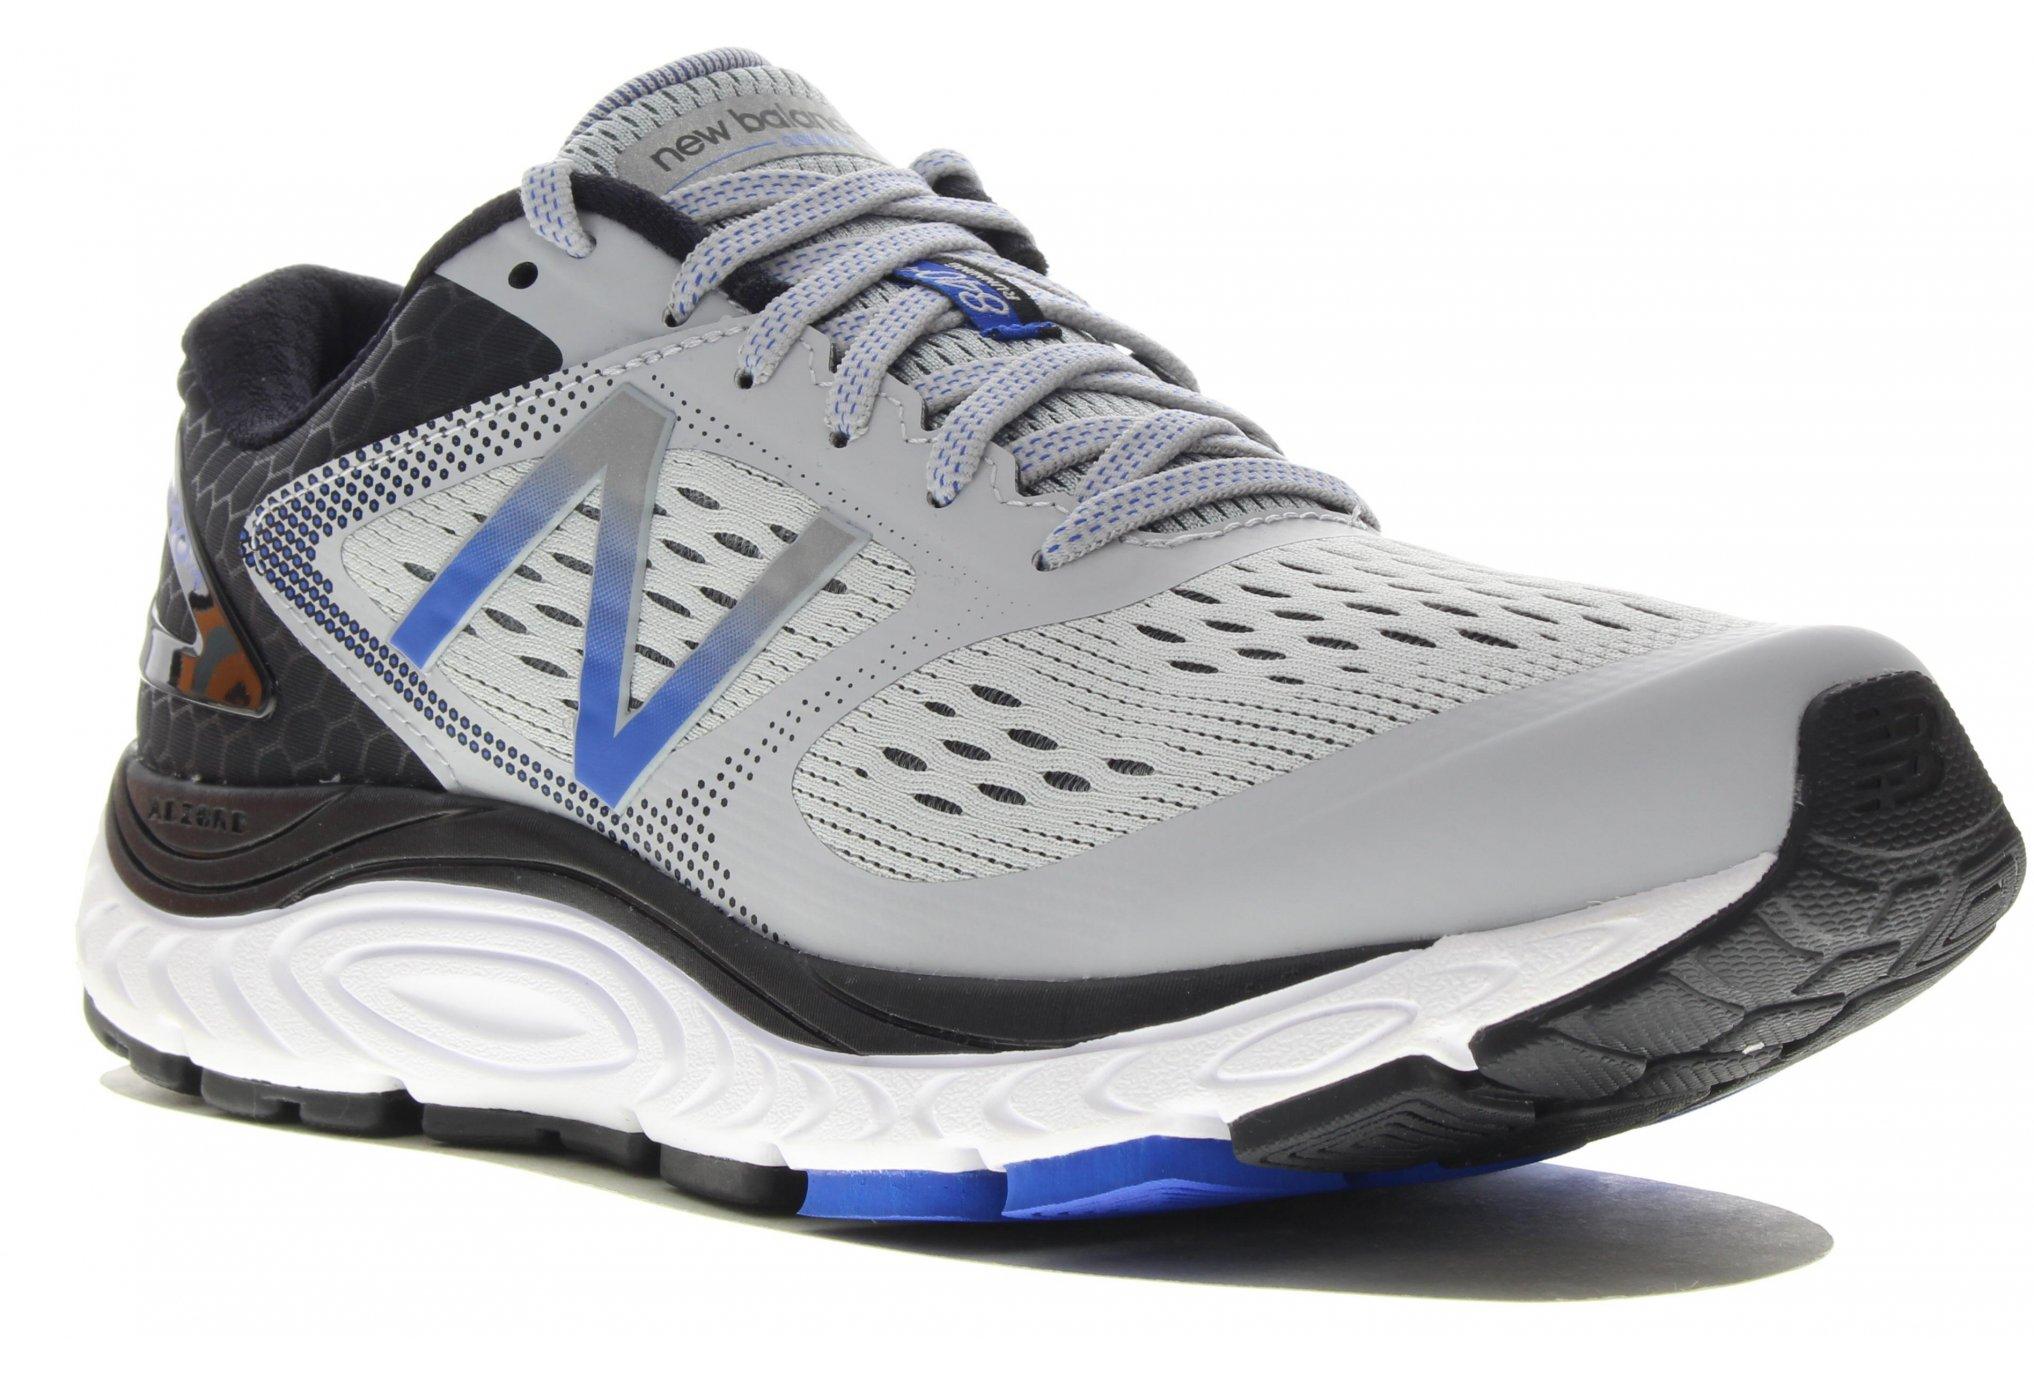 Raid Sénon Aventure New Balance M840 V4 D Chaussures homme